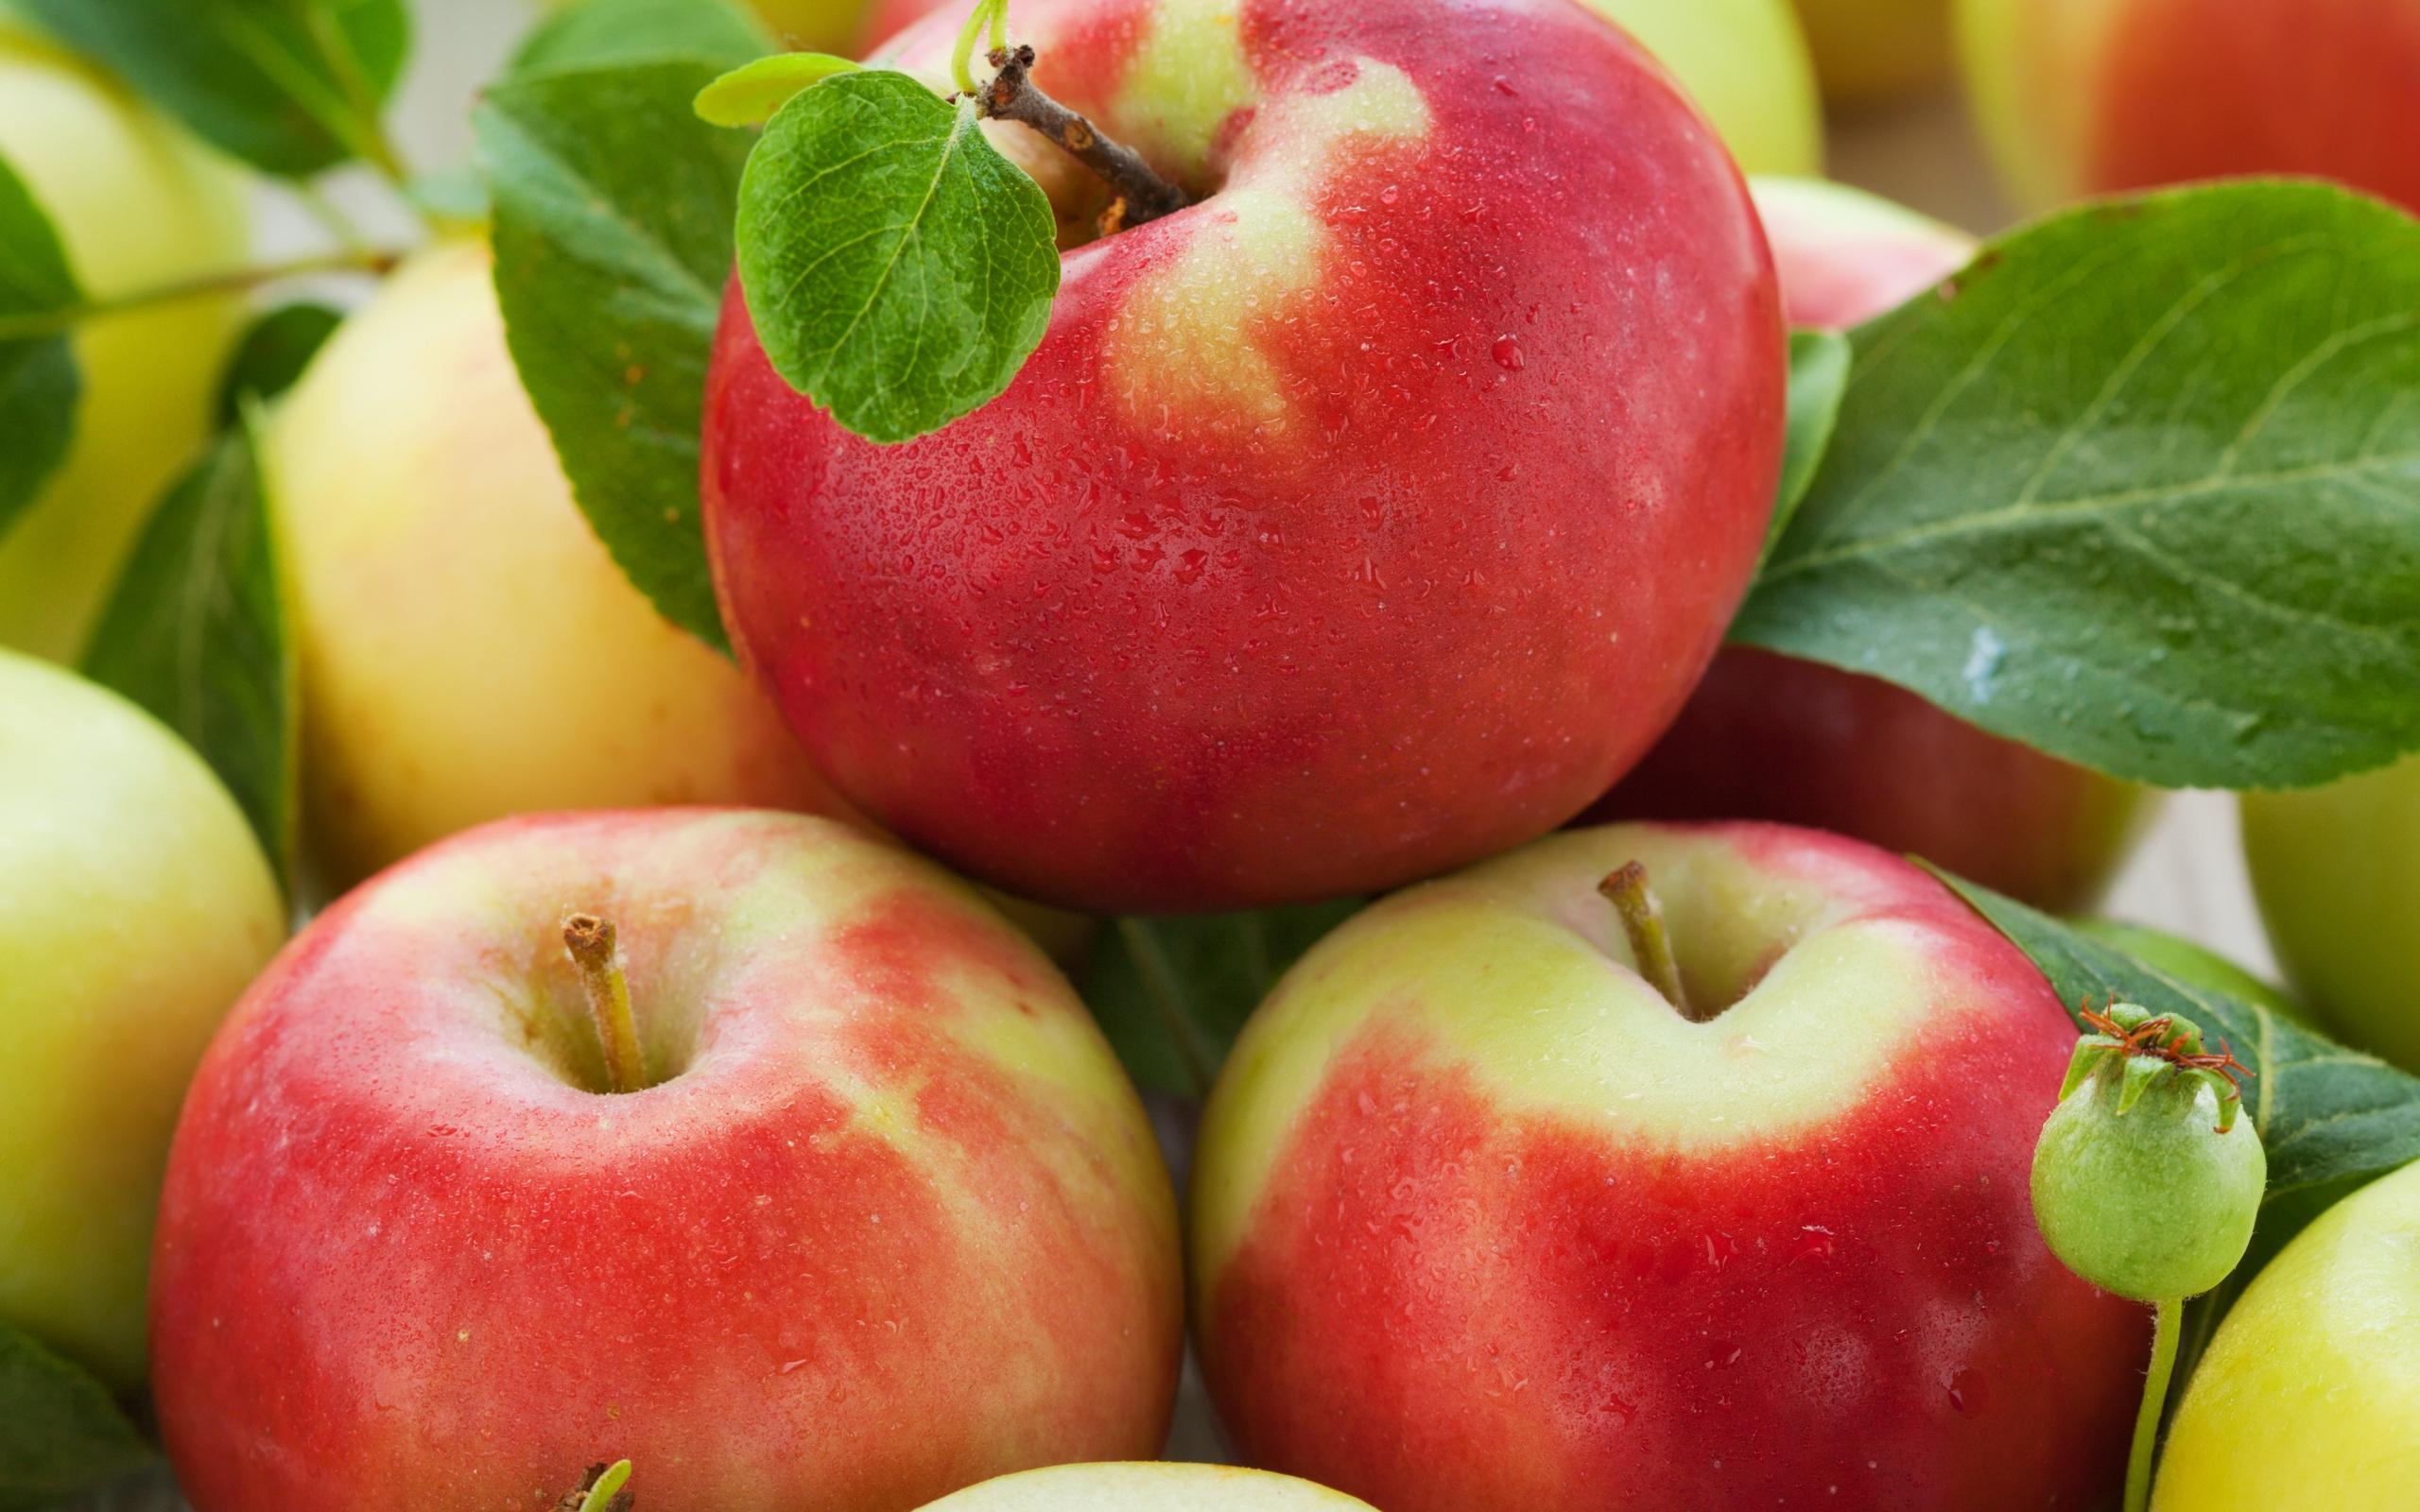 картинки на тему яблок детишкам поможет